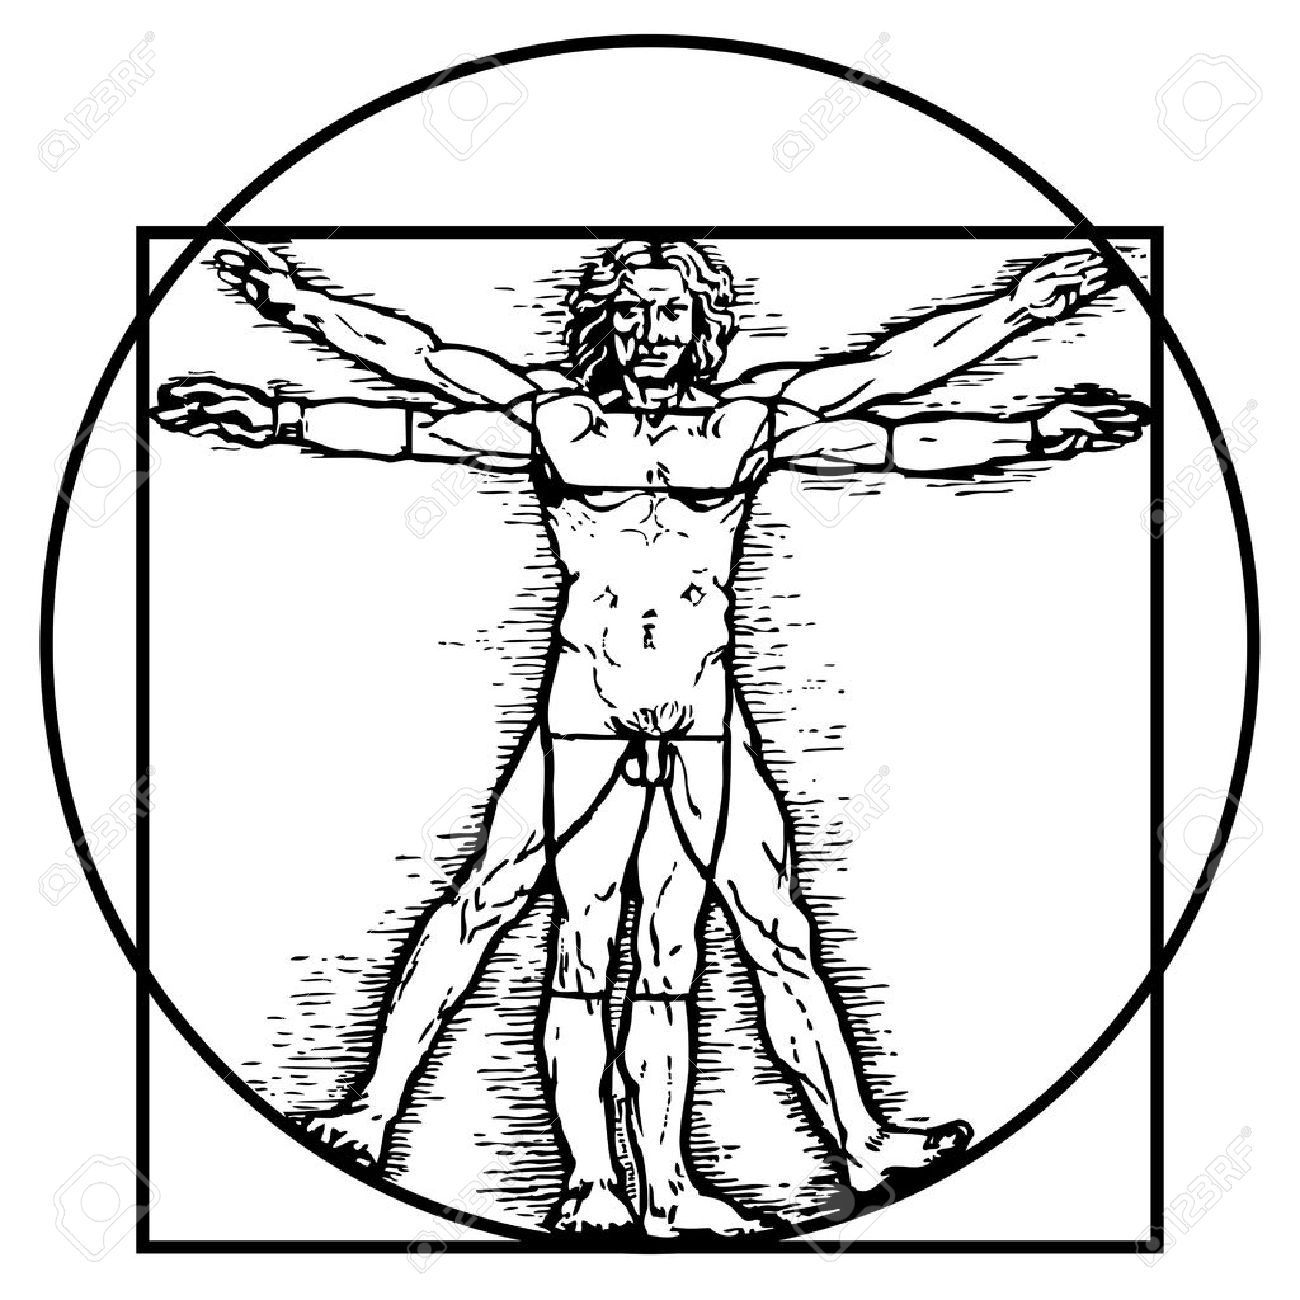 The Vitruvian man - 10066136